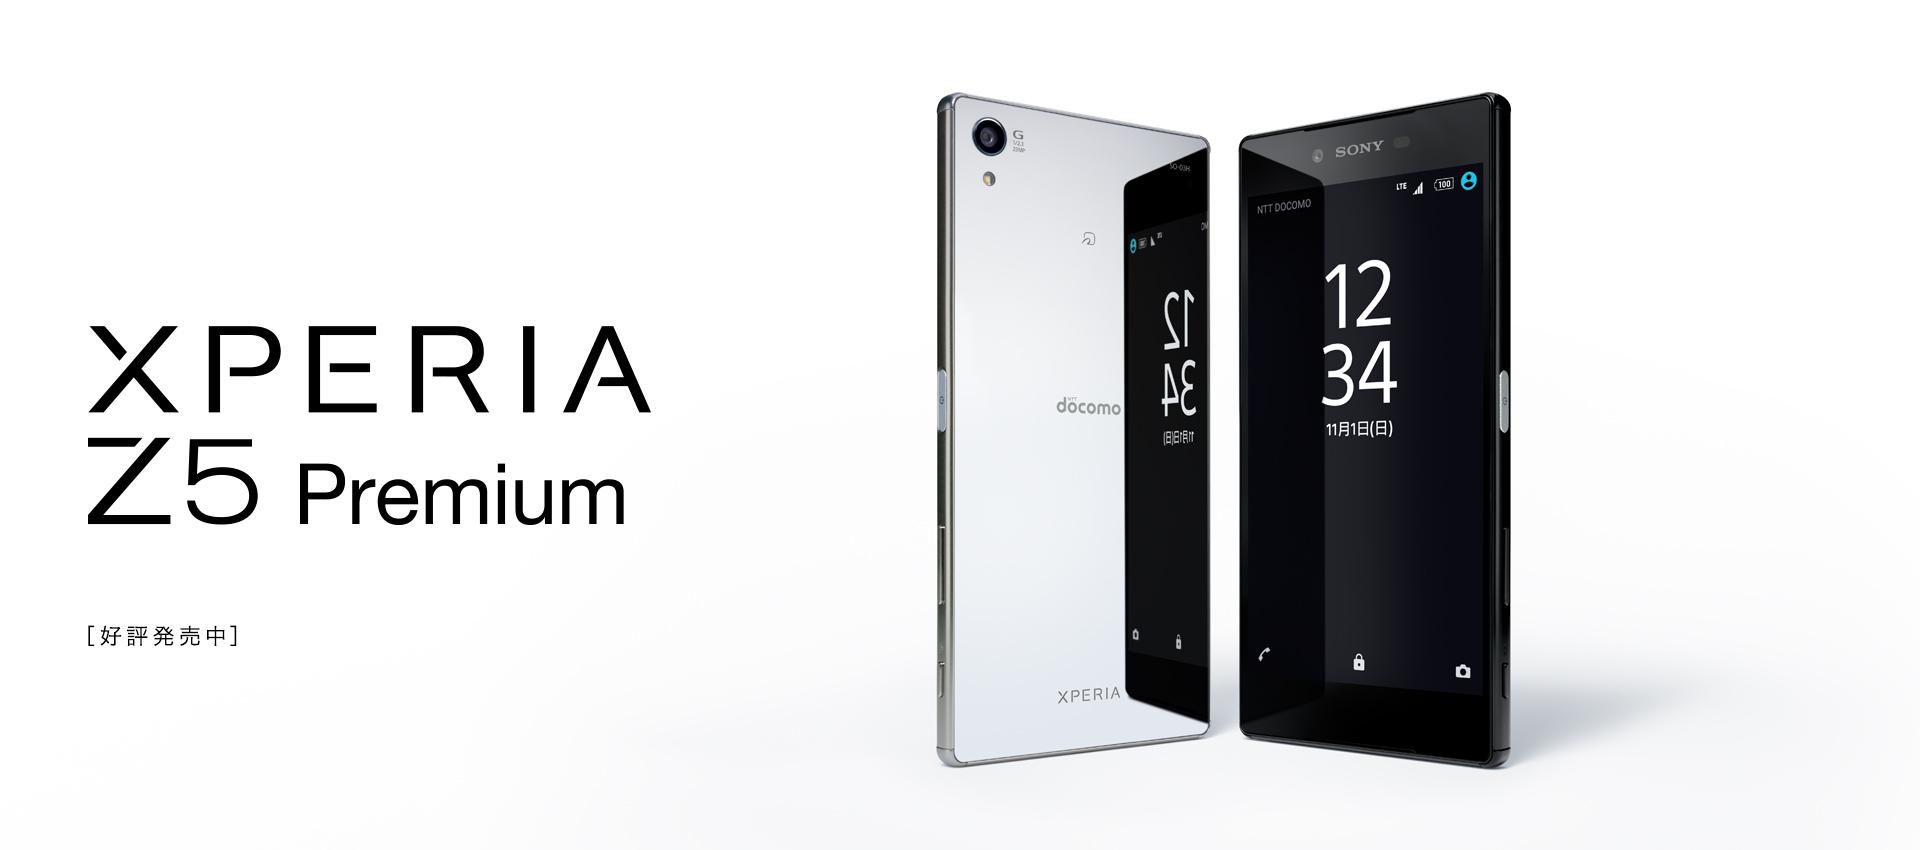 Xperia Z5 Premium SO-03H docomo